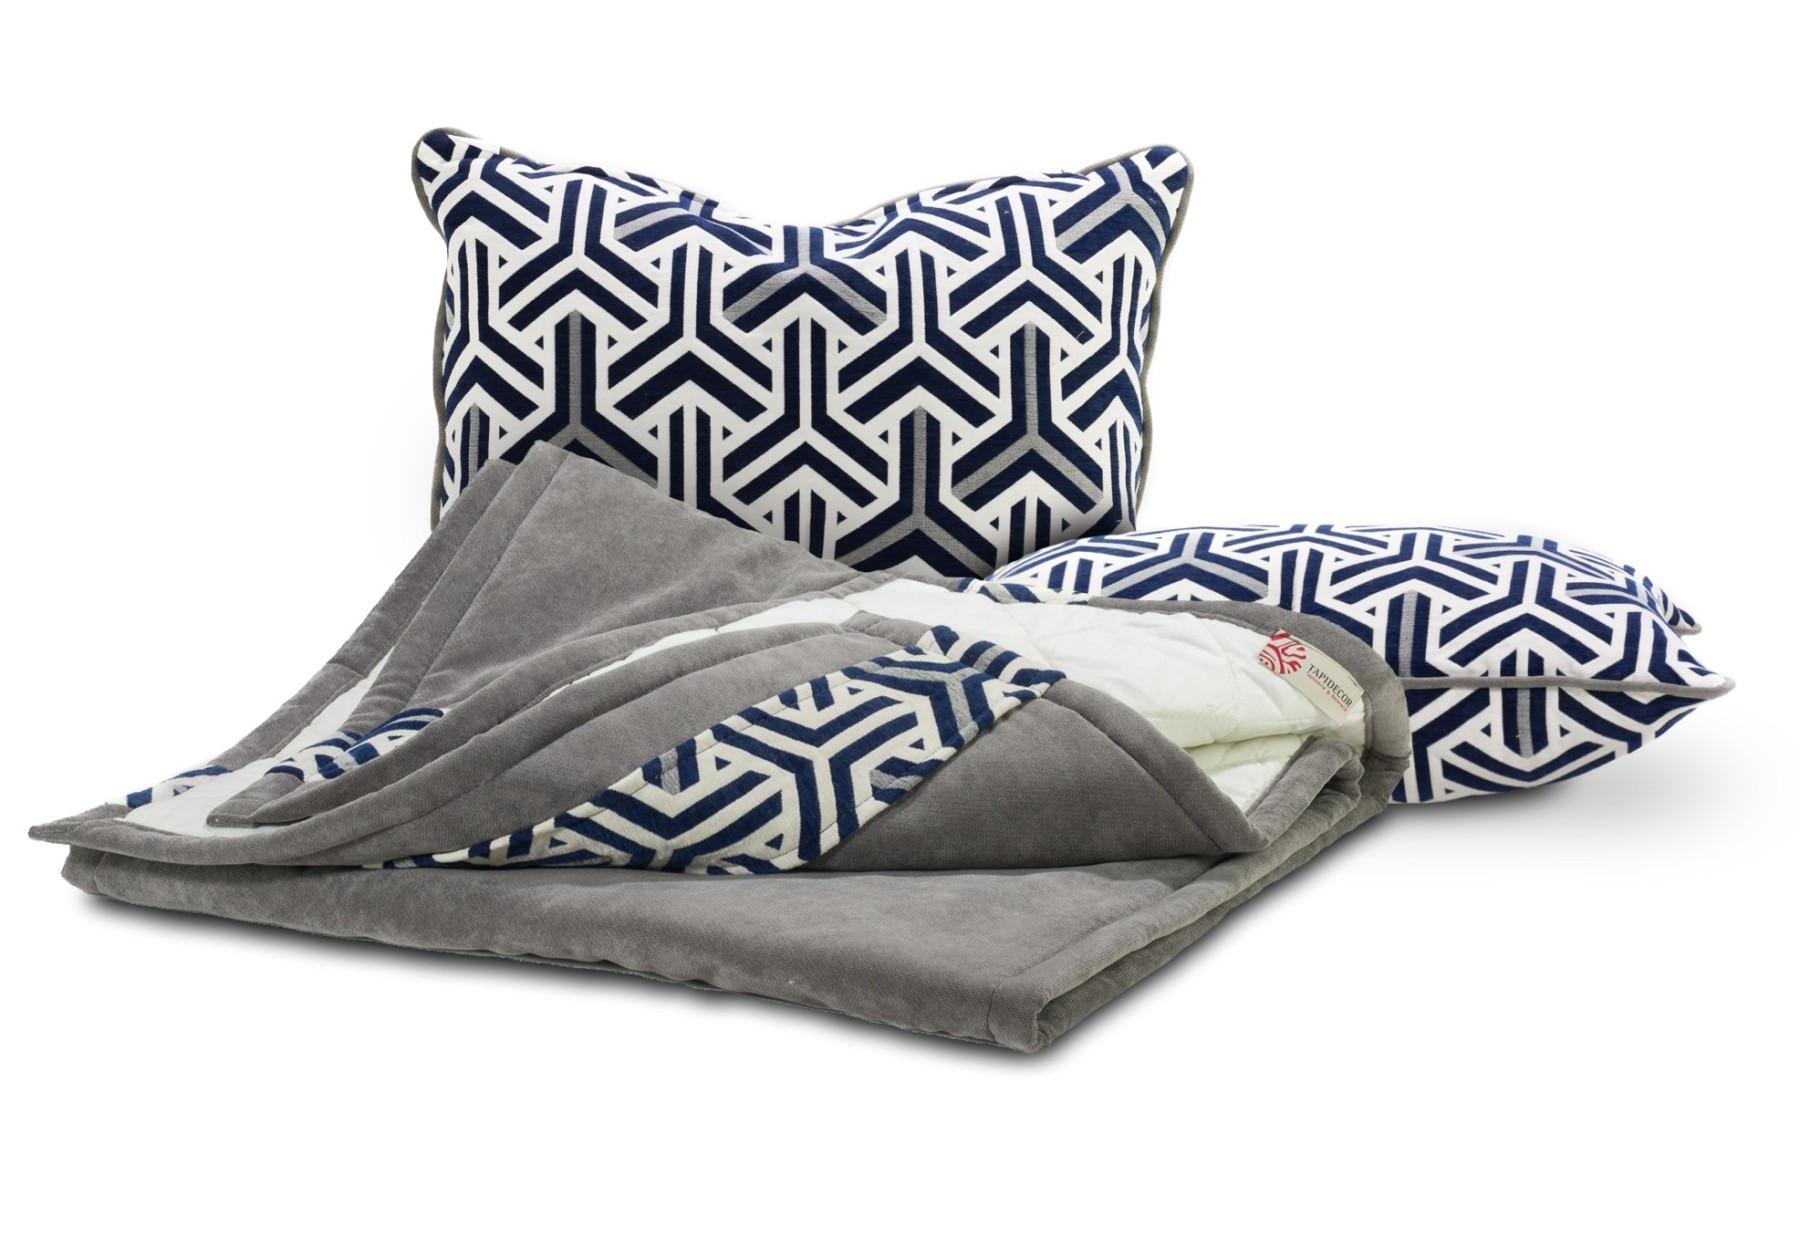 Conjunto 2 capas de almofada decorativas azul marinho/cinza geométrico 70x50 e 1 xadrez 200x65